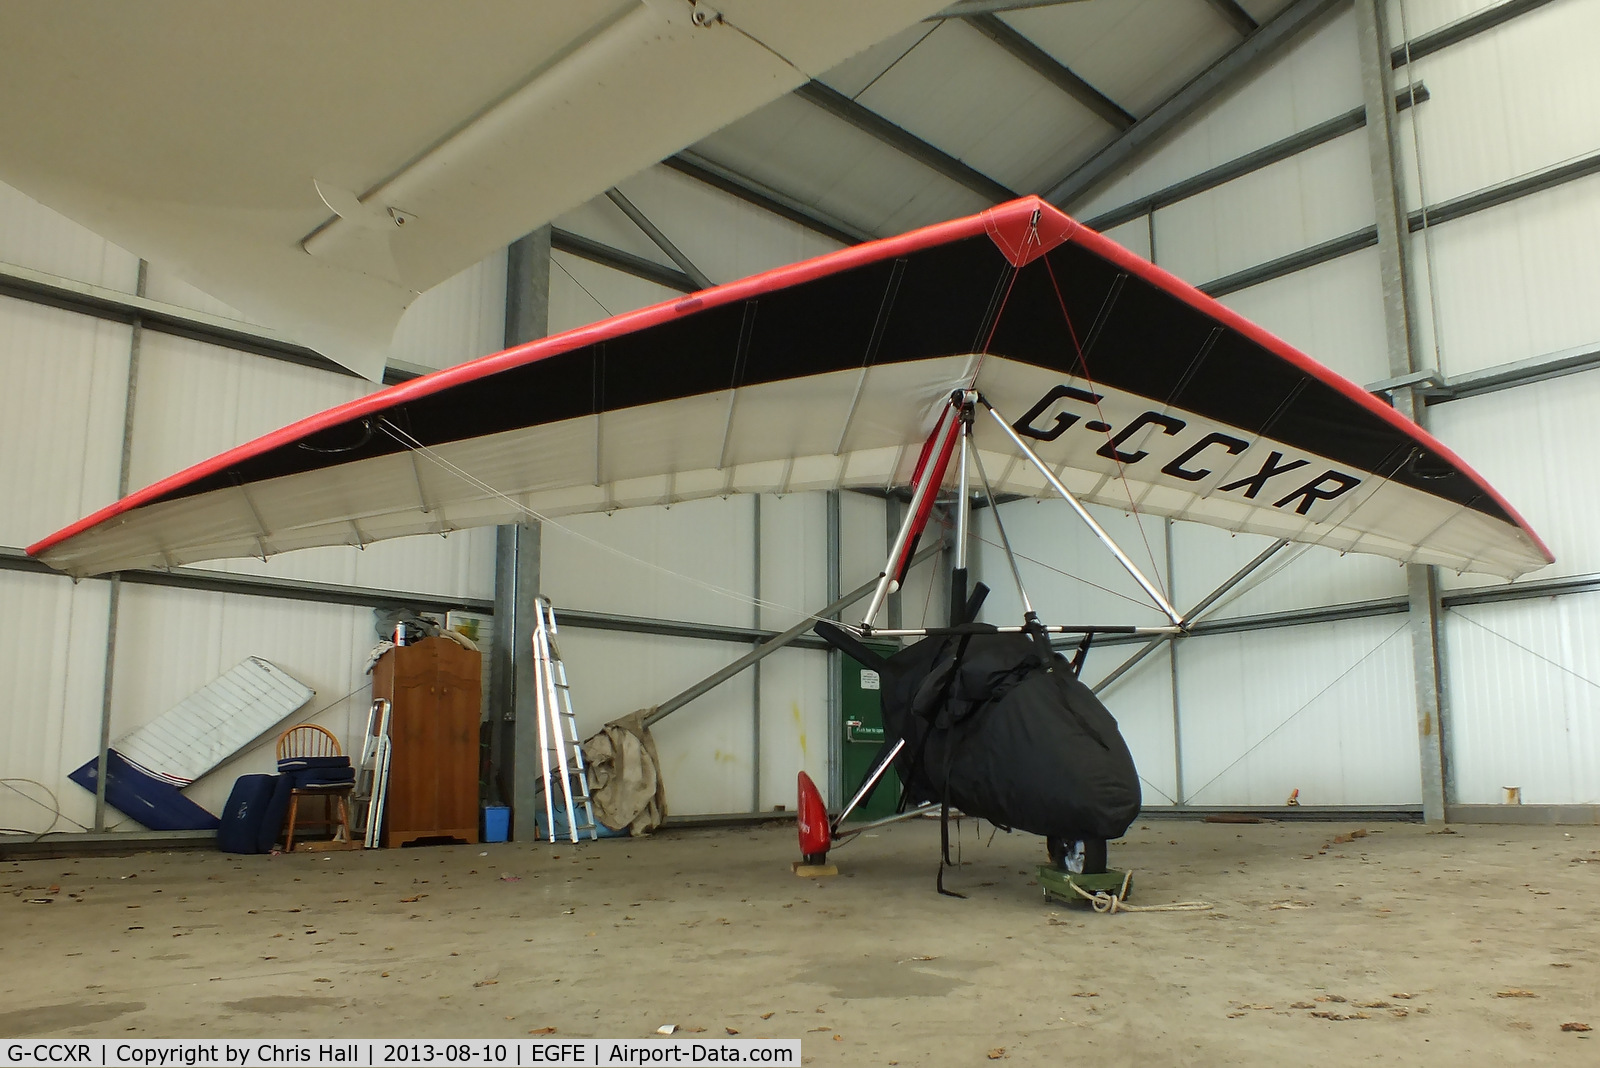 G-CCXR, 2004 Mainair Blade C/N 1367-0604-7-W1162, privately owned